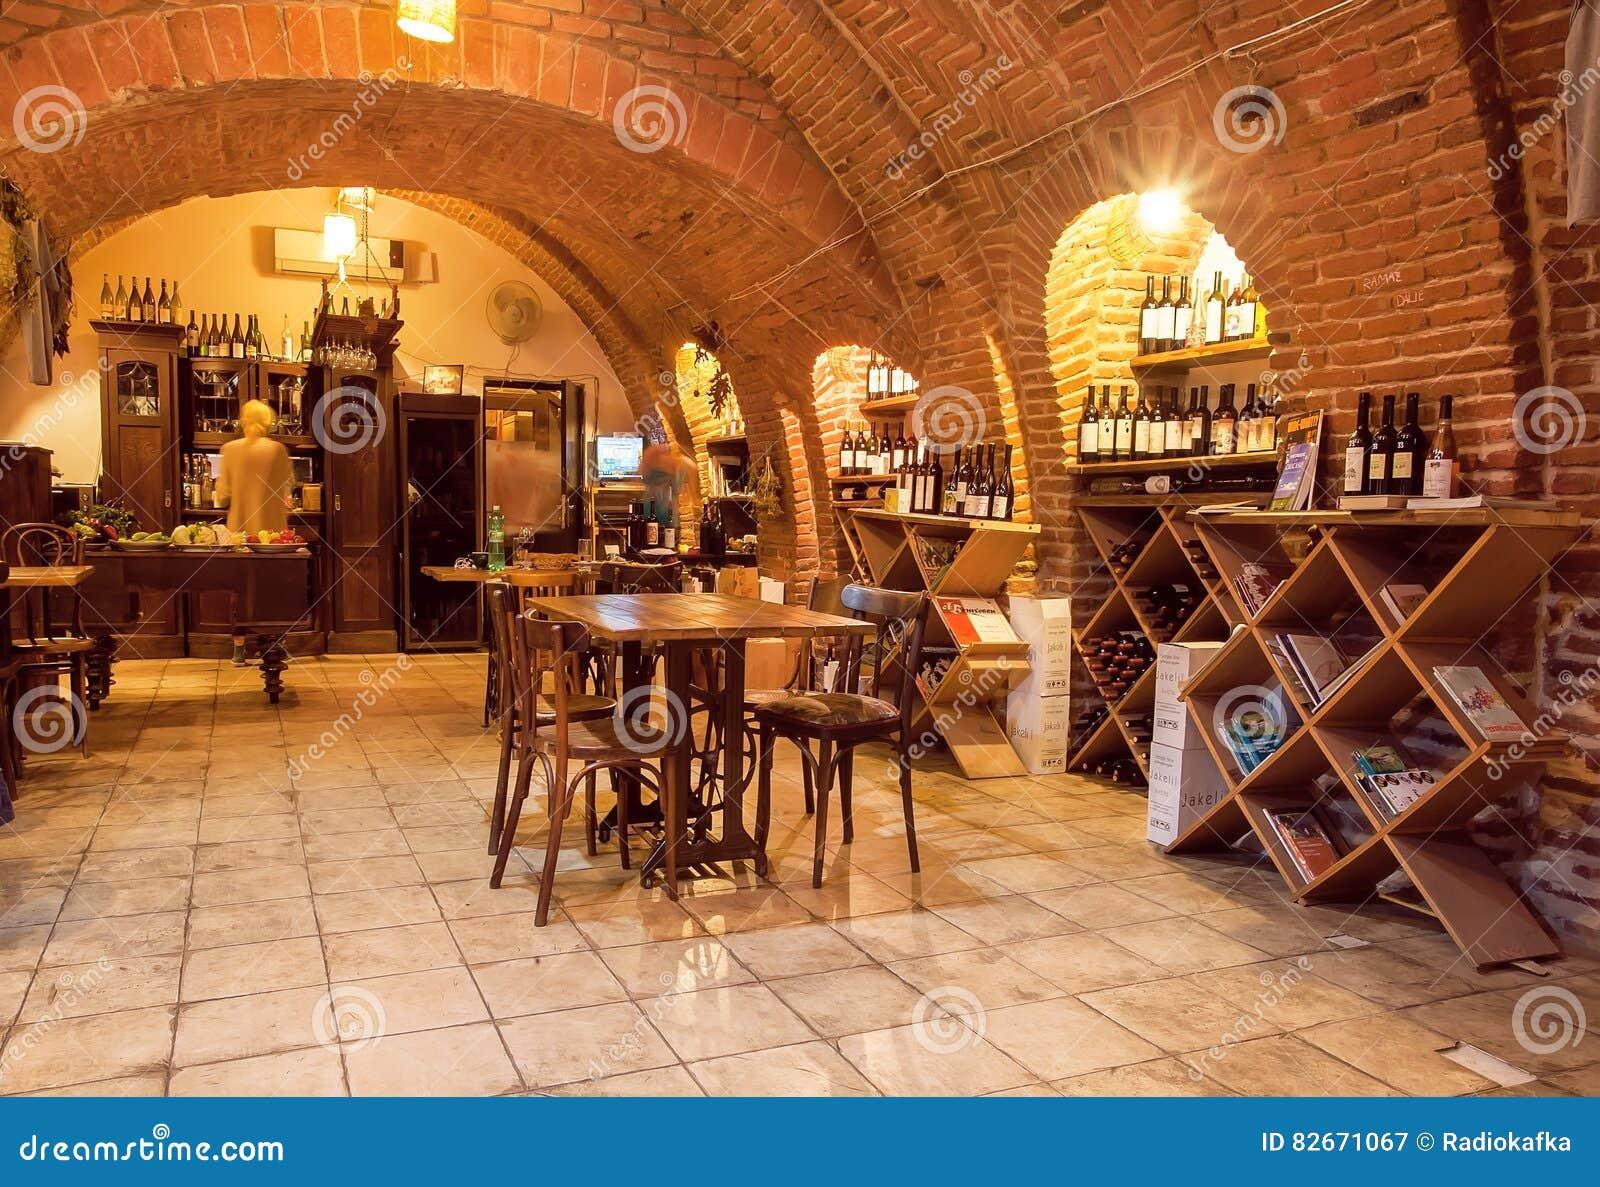 Empty wine bar inside the old brick underground with